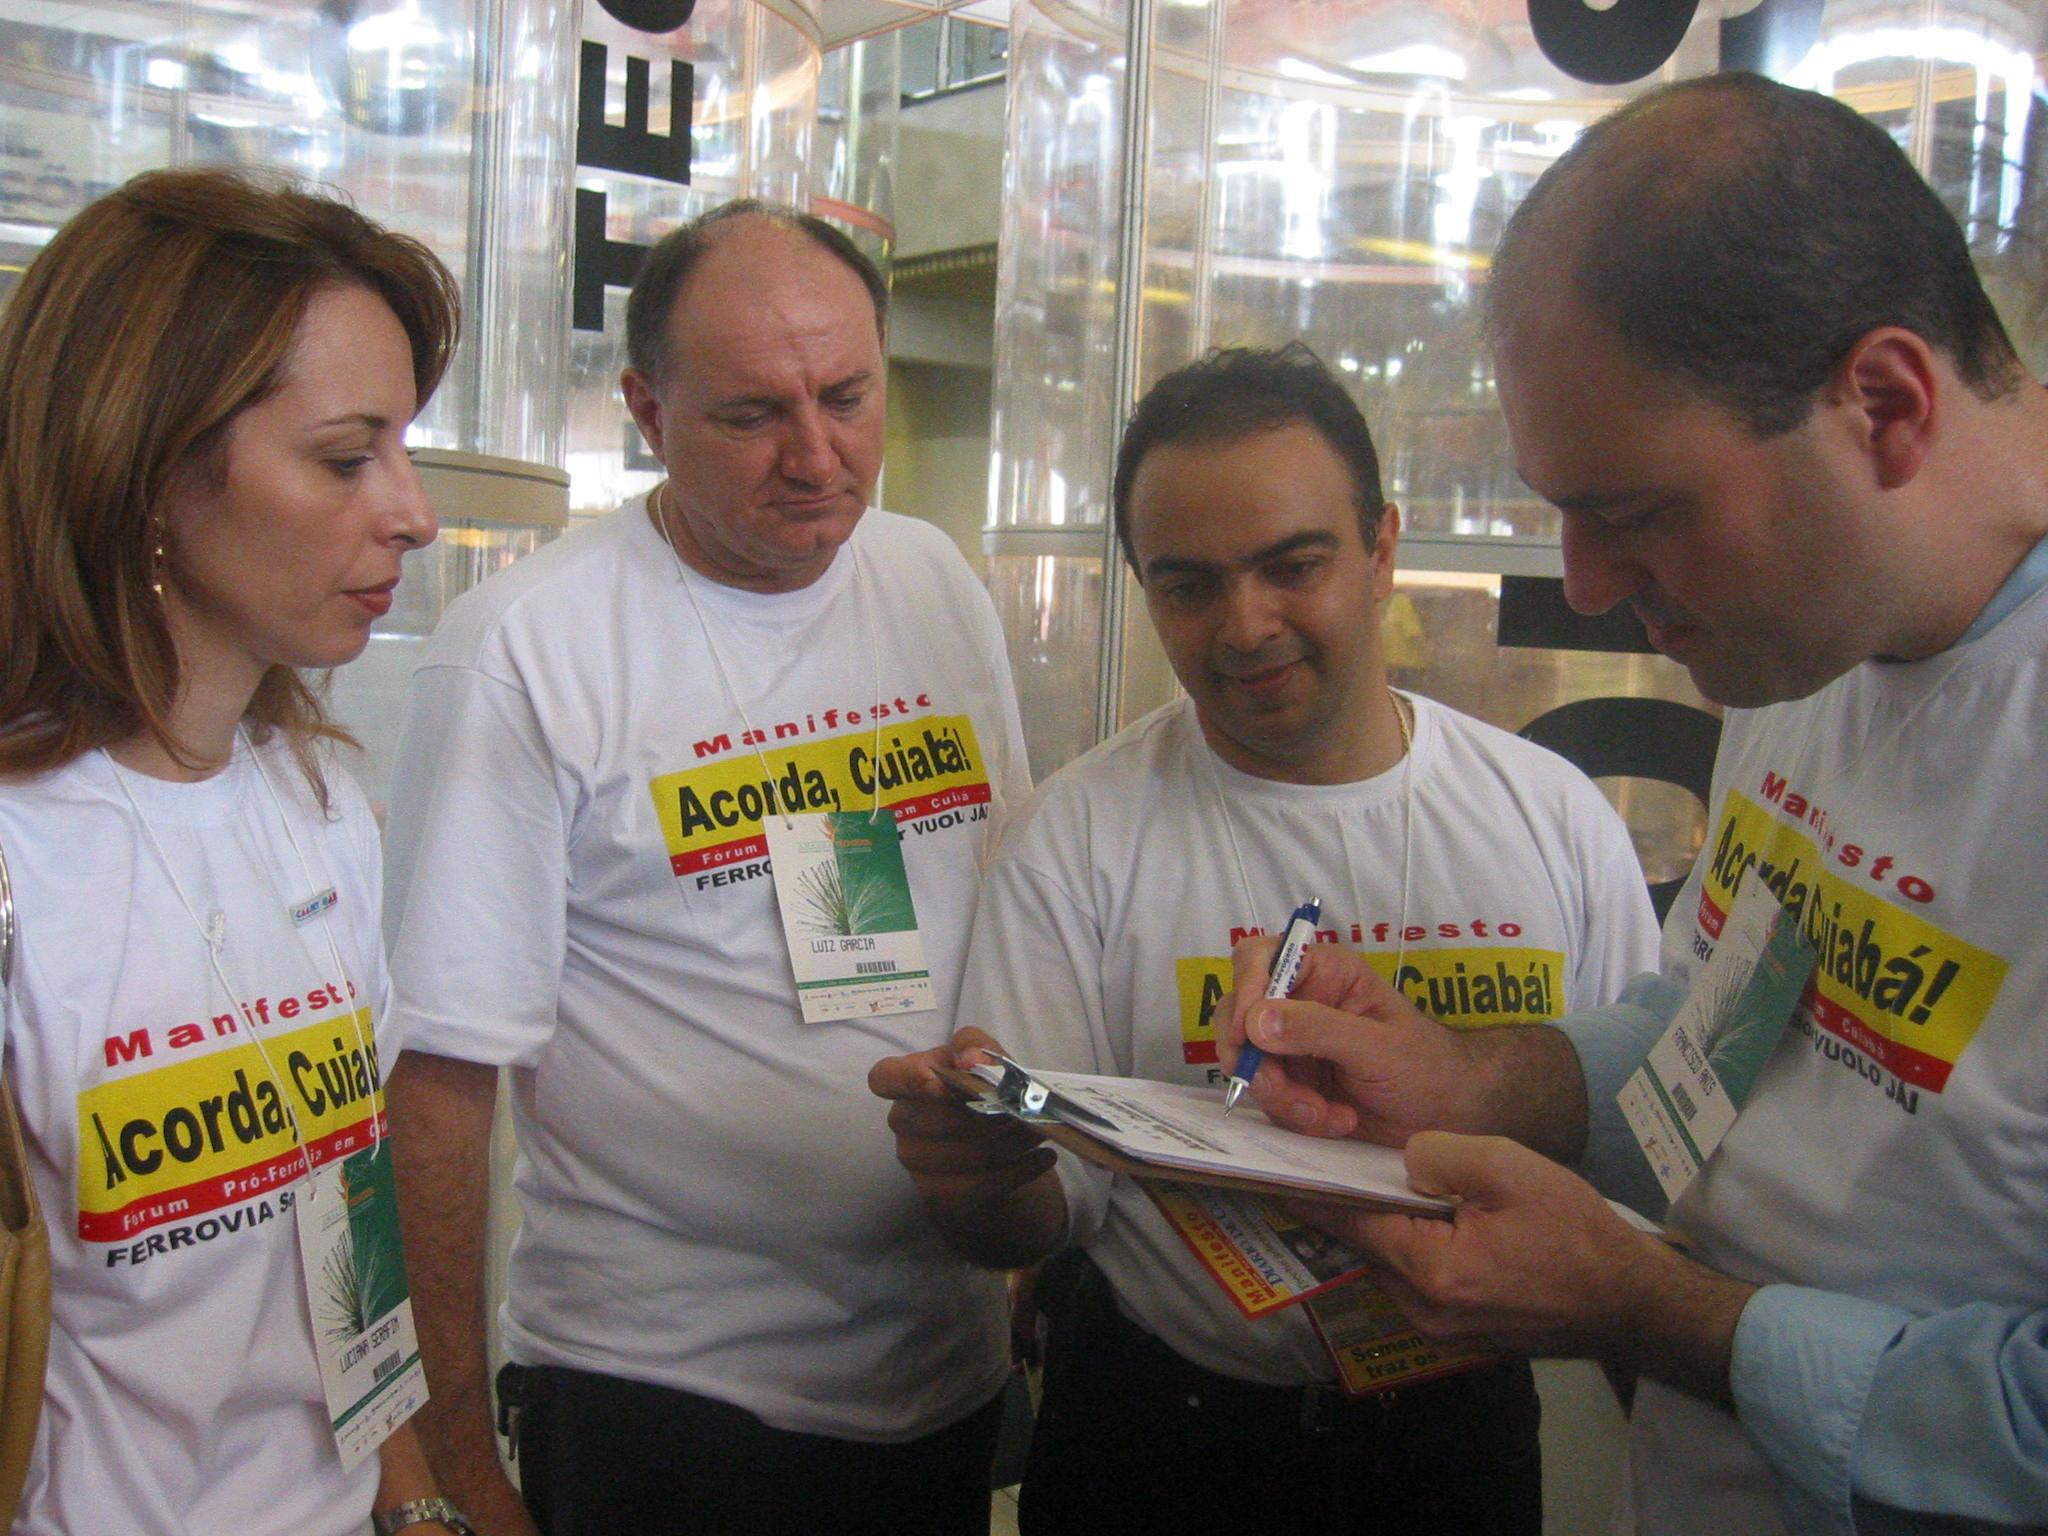 Manifesto Fórum Acorda, Cuiabá! 1